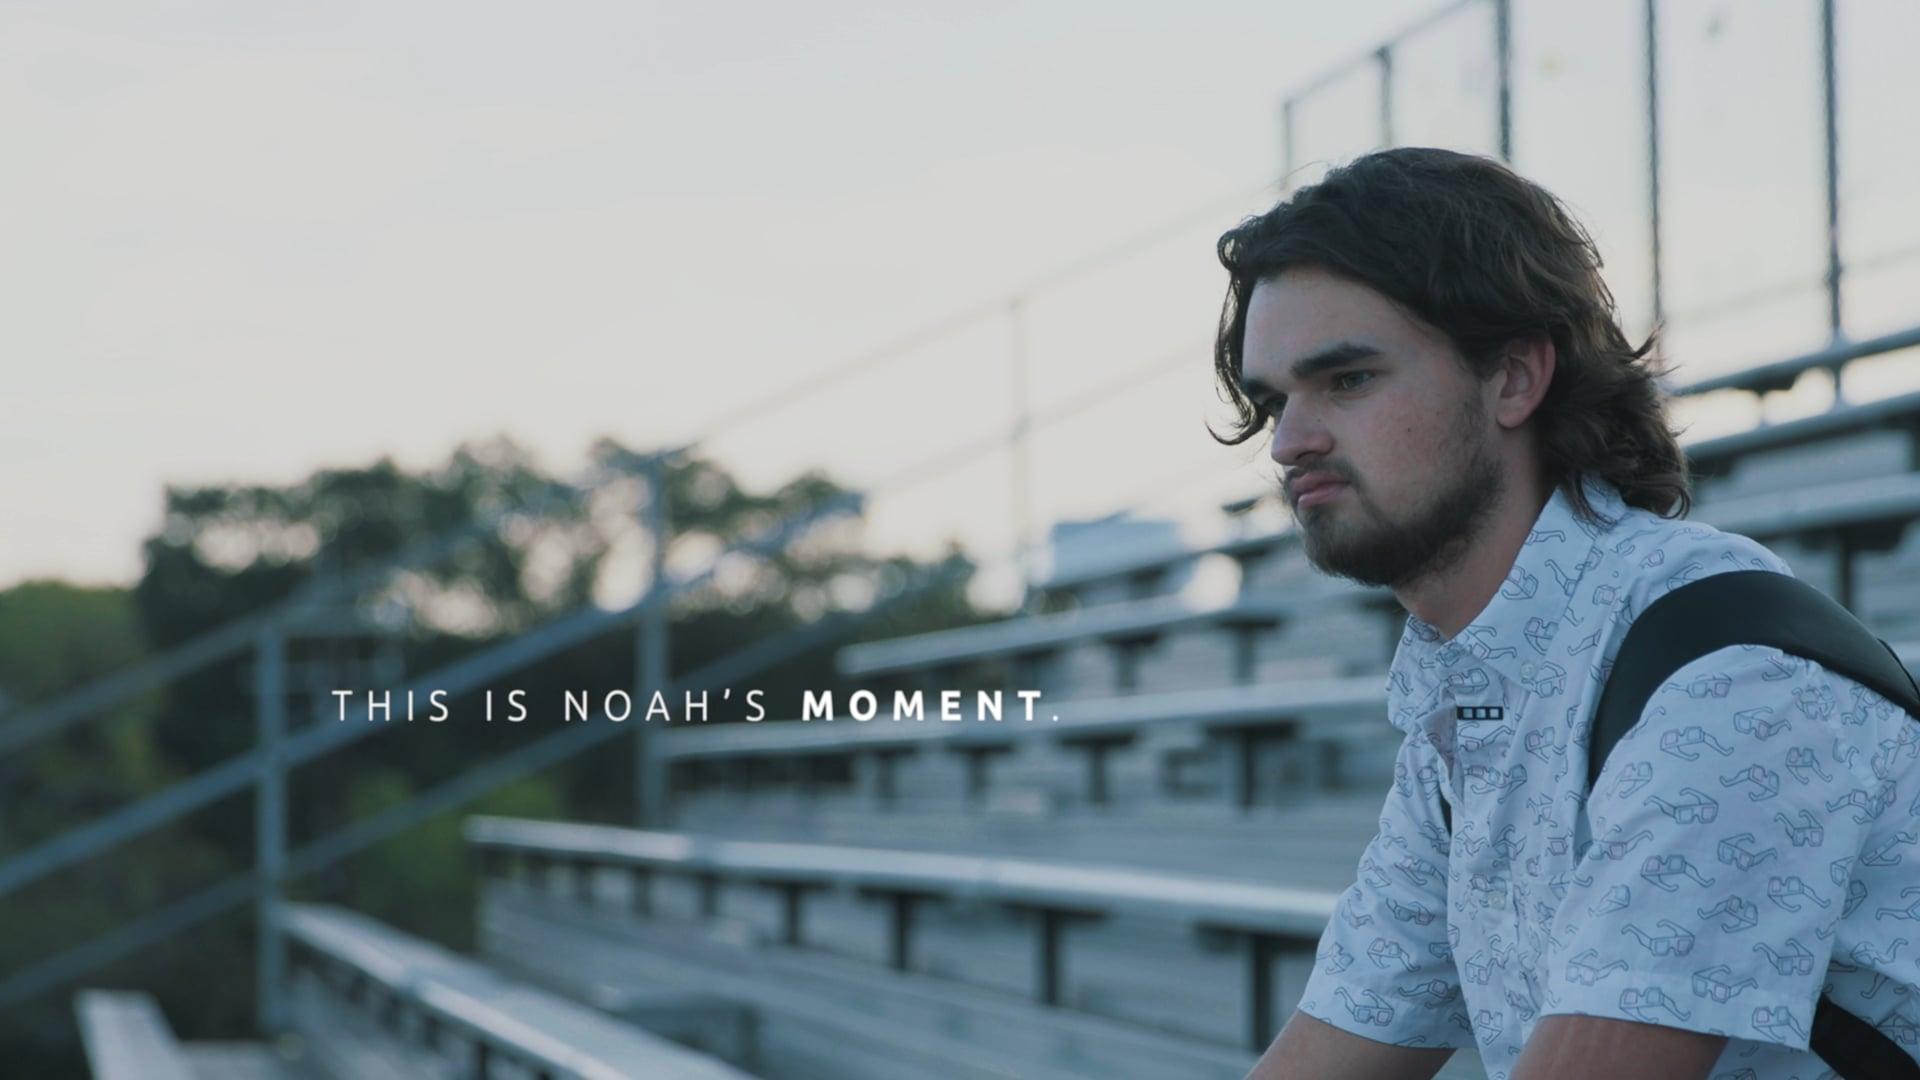 THE MOMENT SERIES_NOAH_MAIN FILM